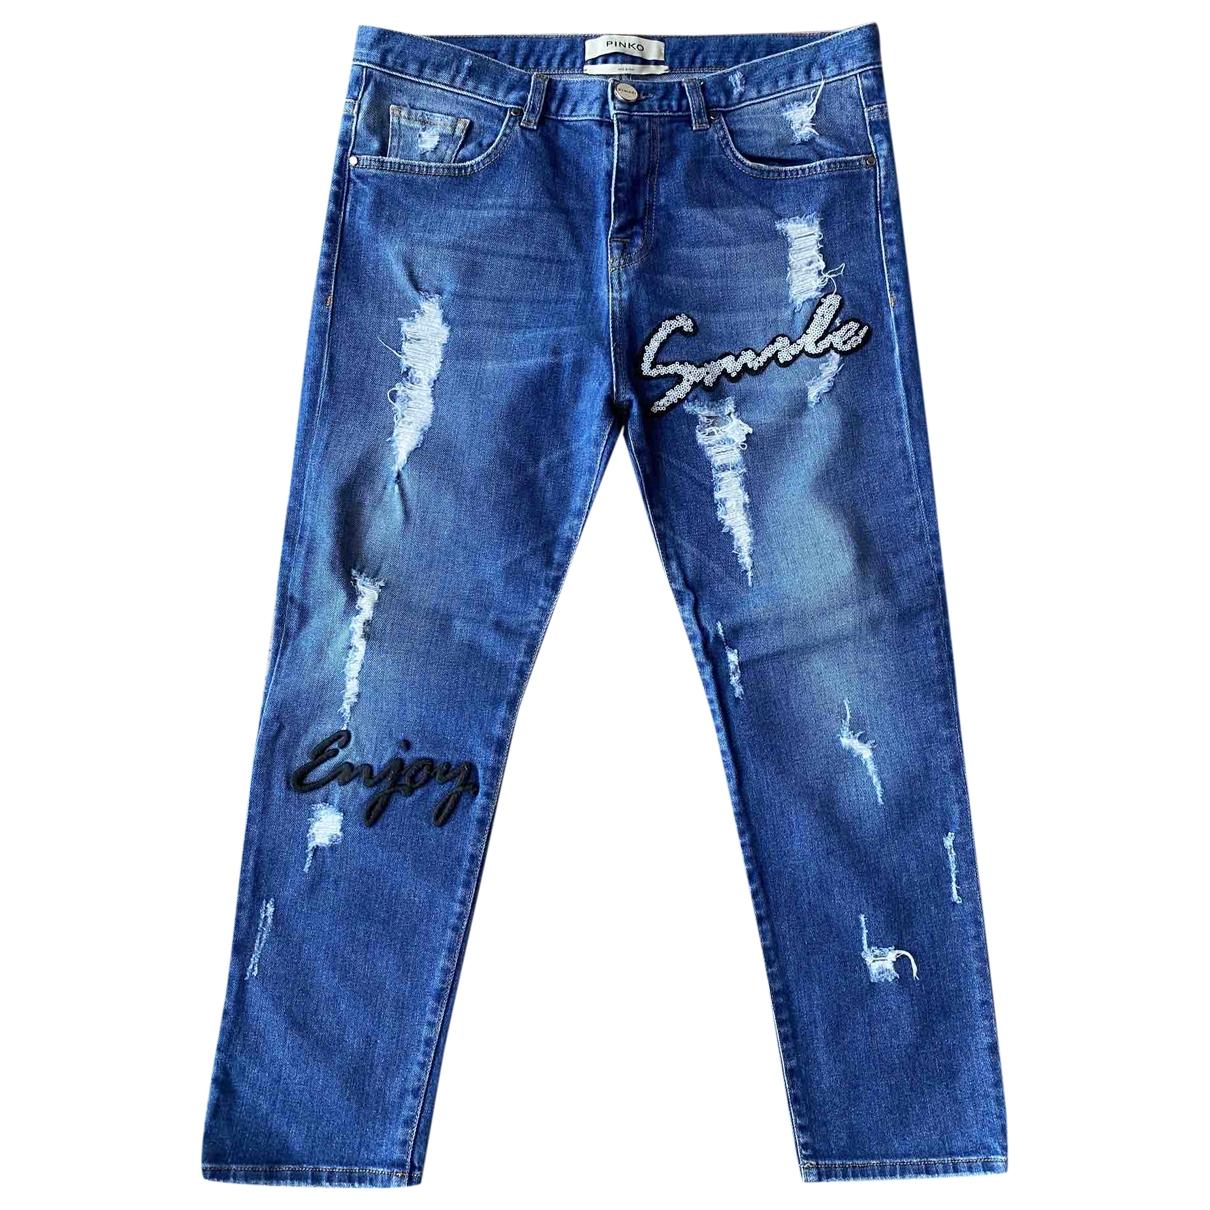 Pinko \N Blue Denim - Jeans Jeans for Women 28 US